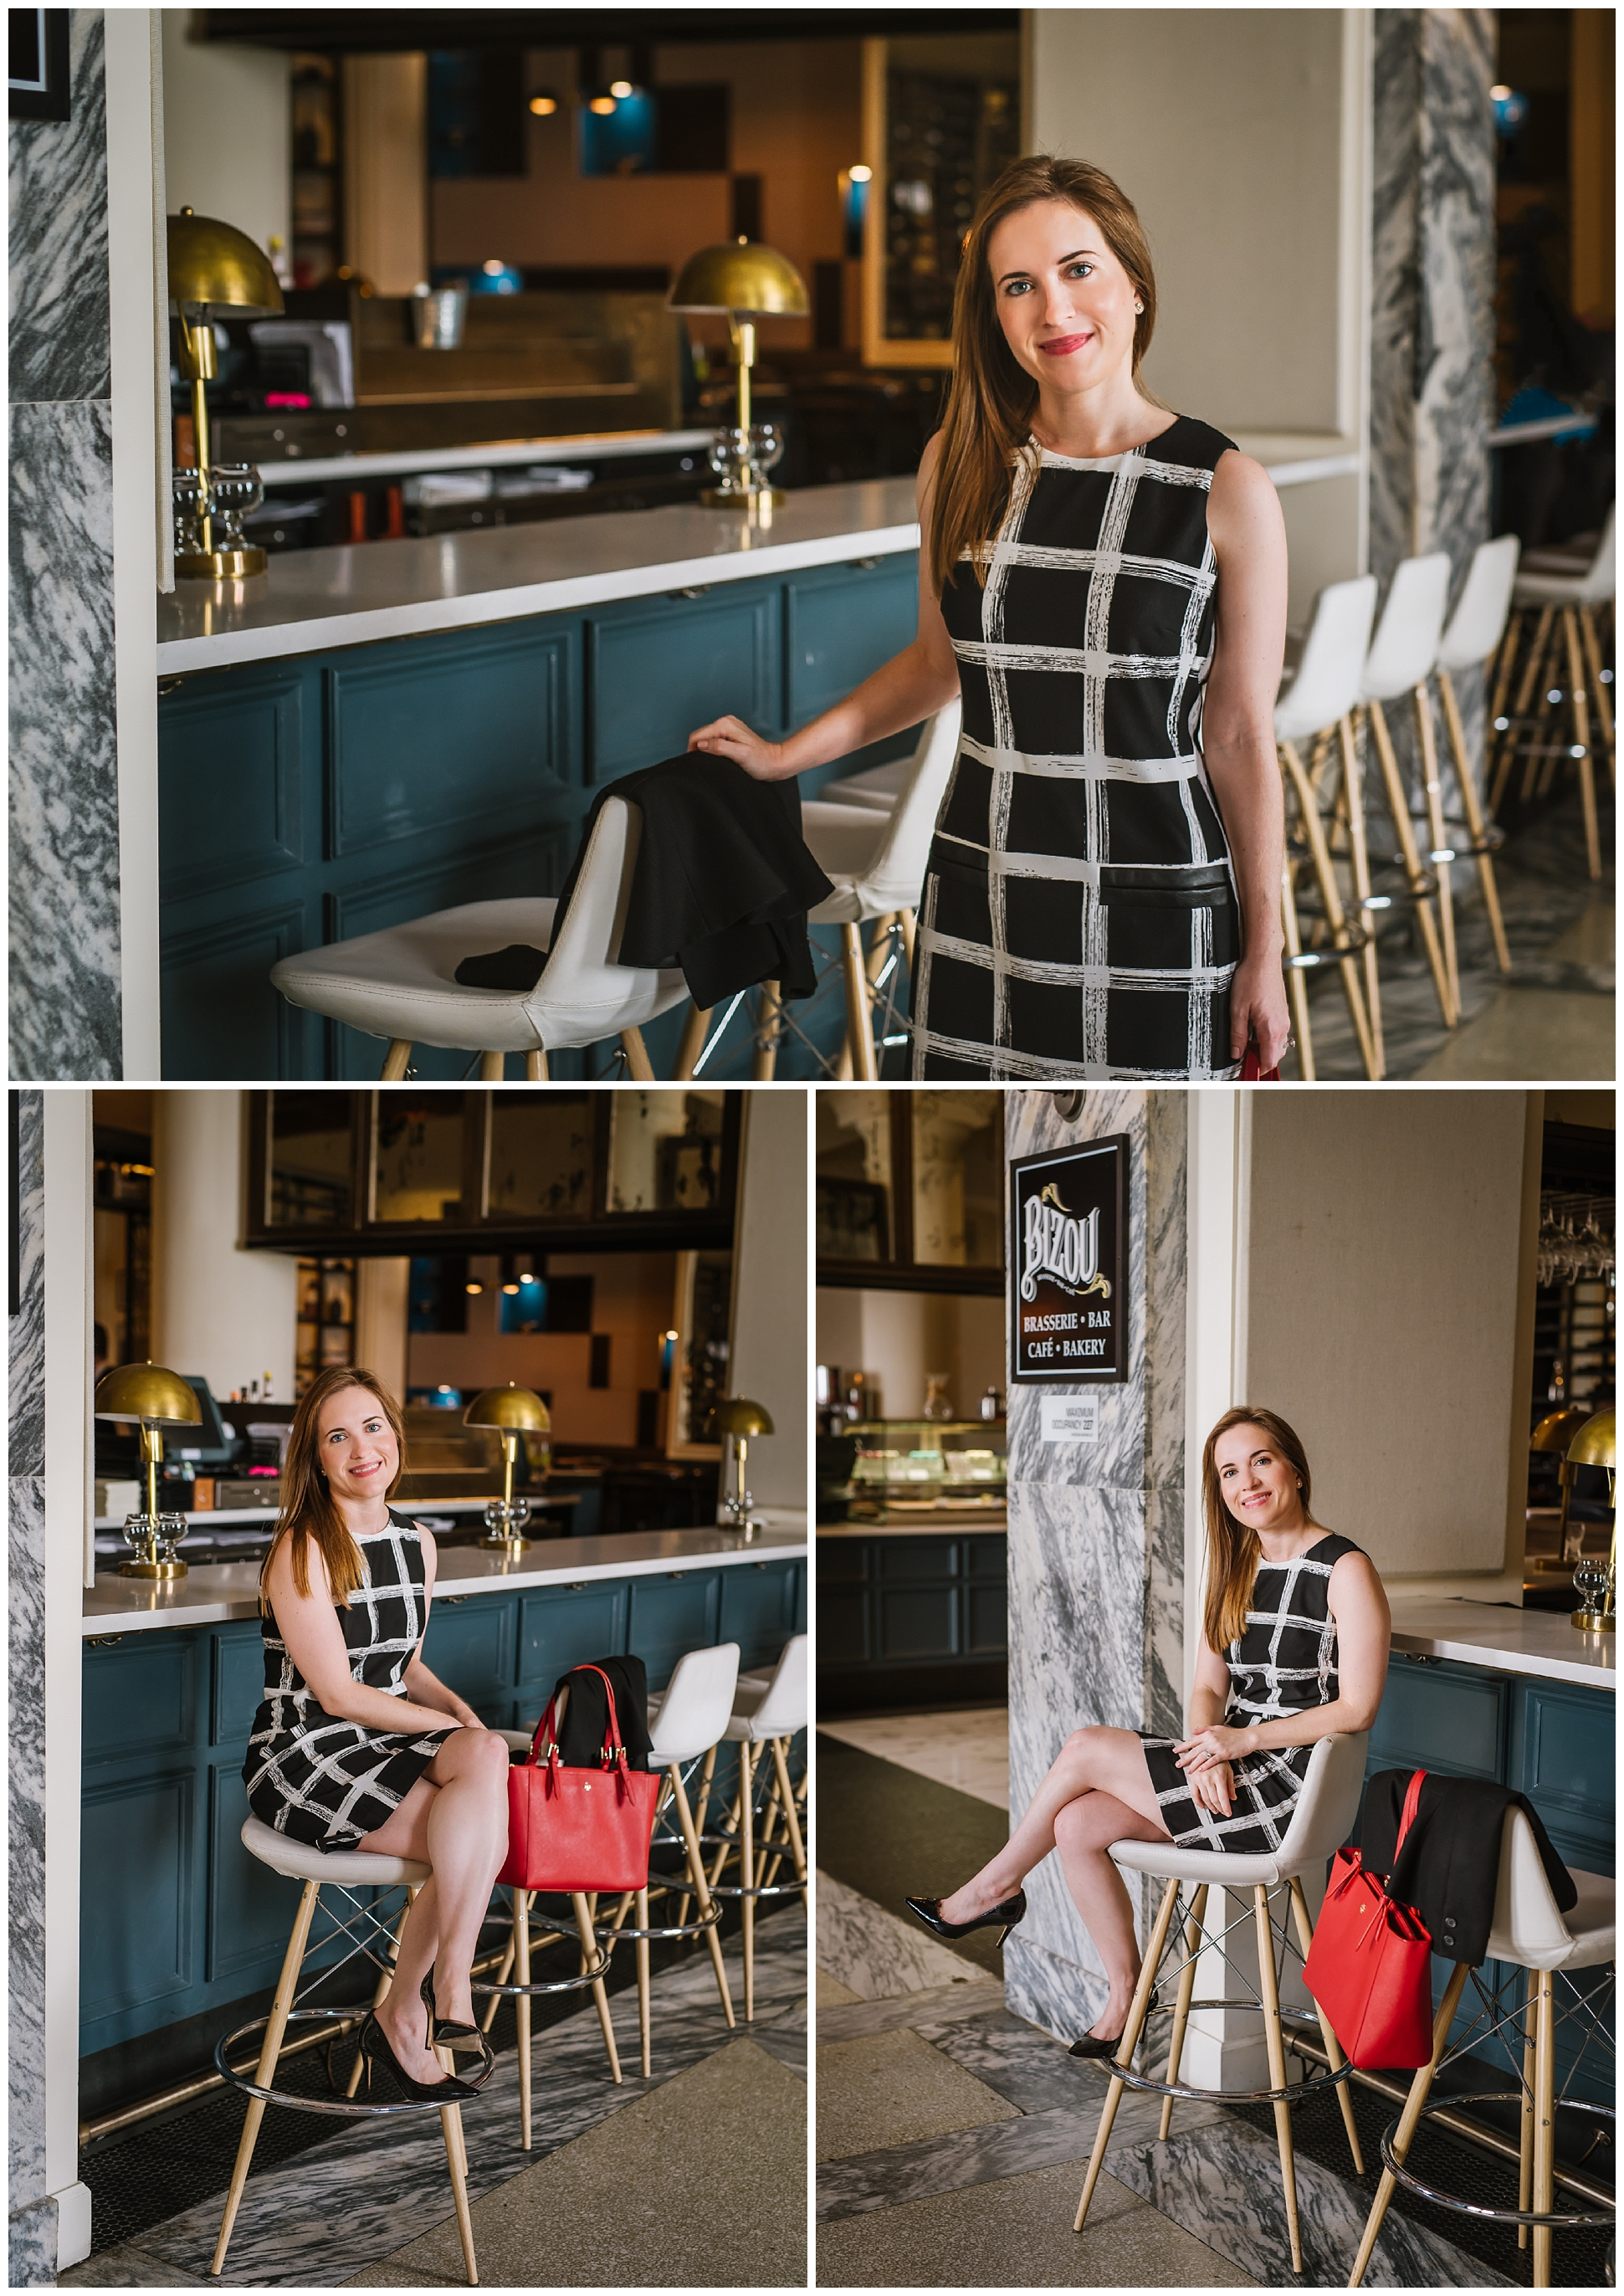 Tampa-lifestyle-bradning-fashion-blogger-photographer_0017.jpg